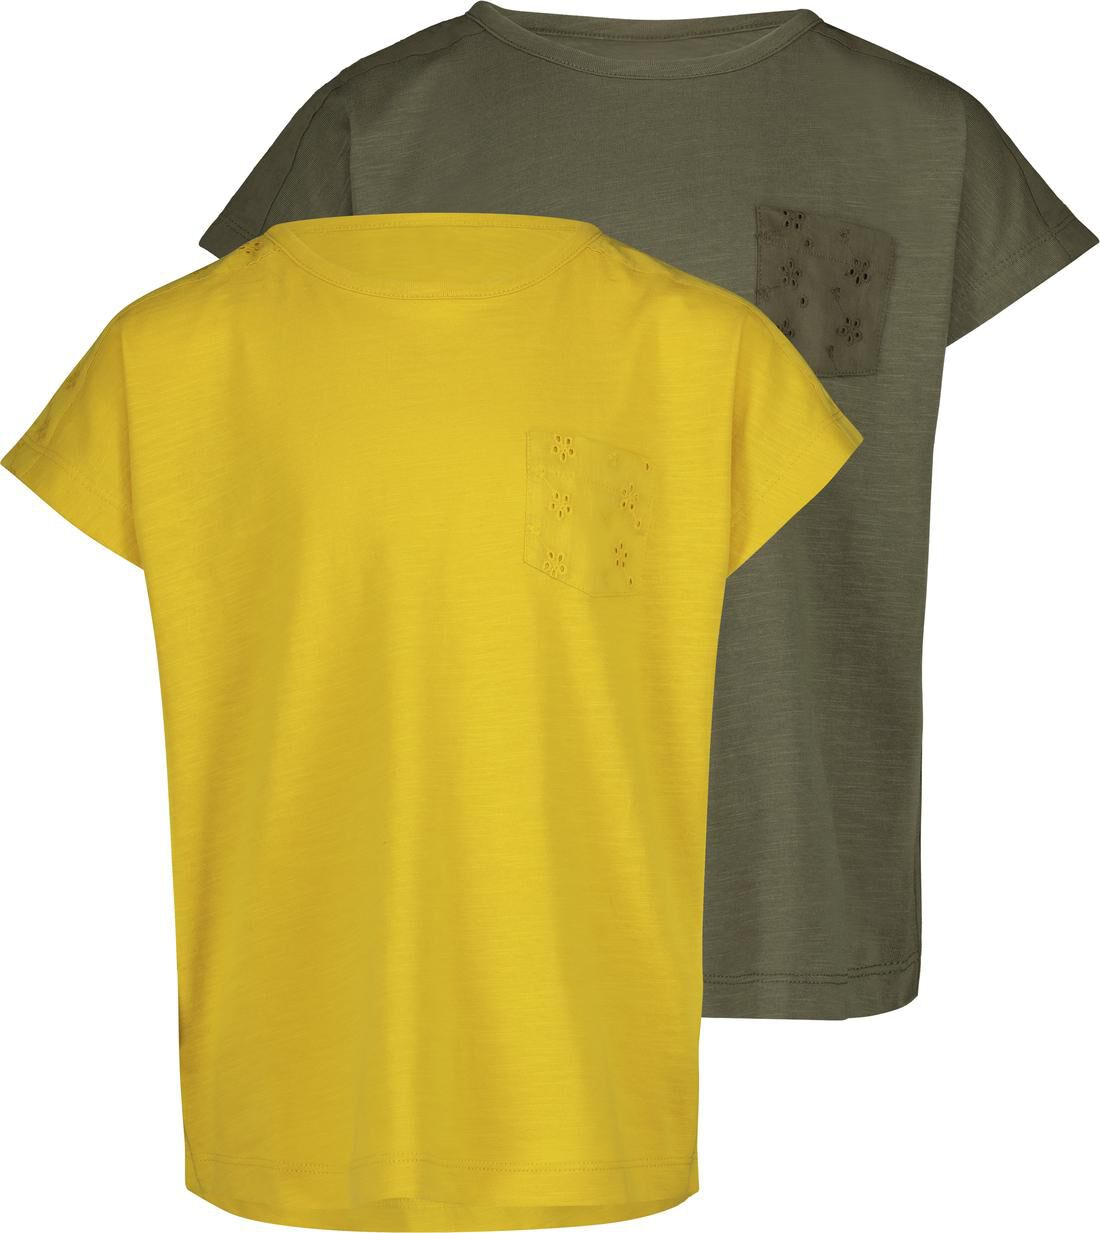 HEMA 2-pak Kinder T-shirts Geel (geel)